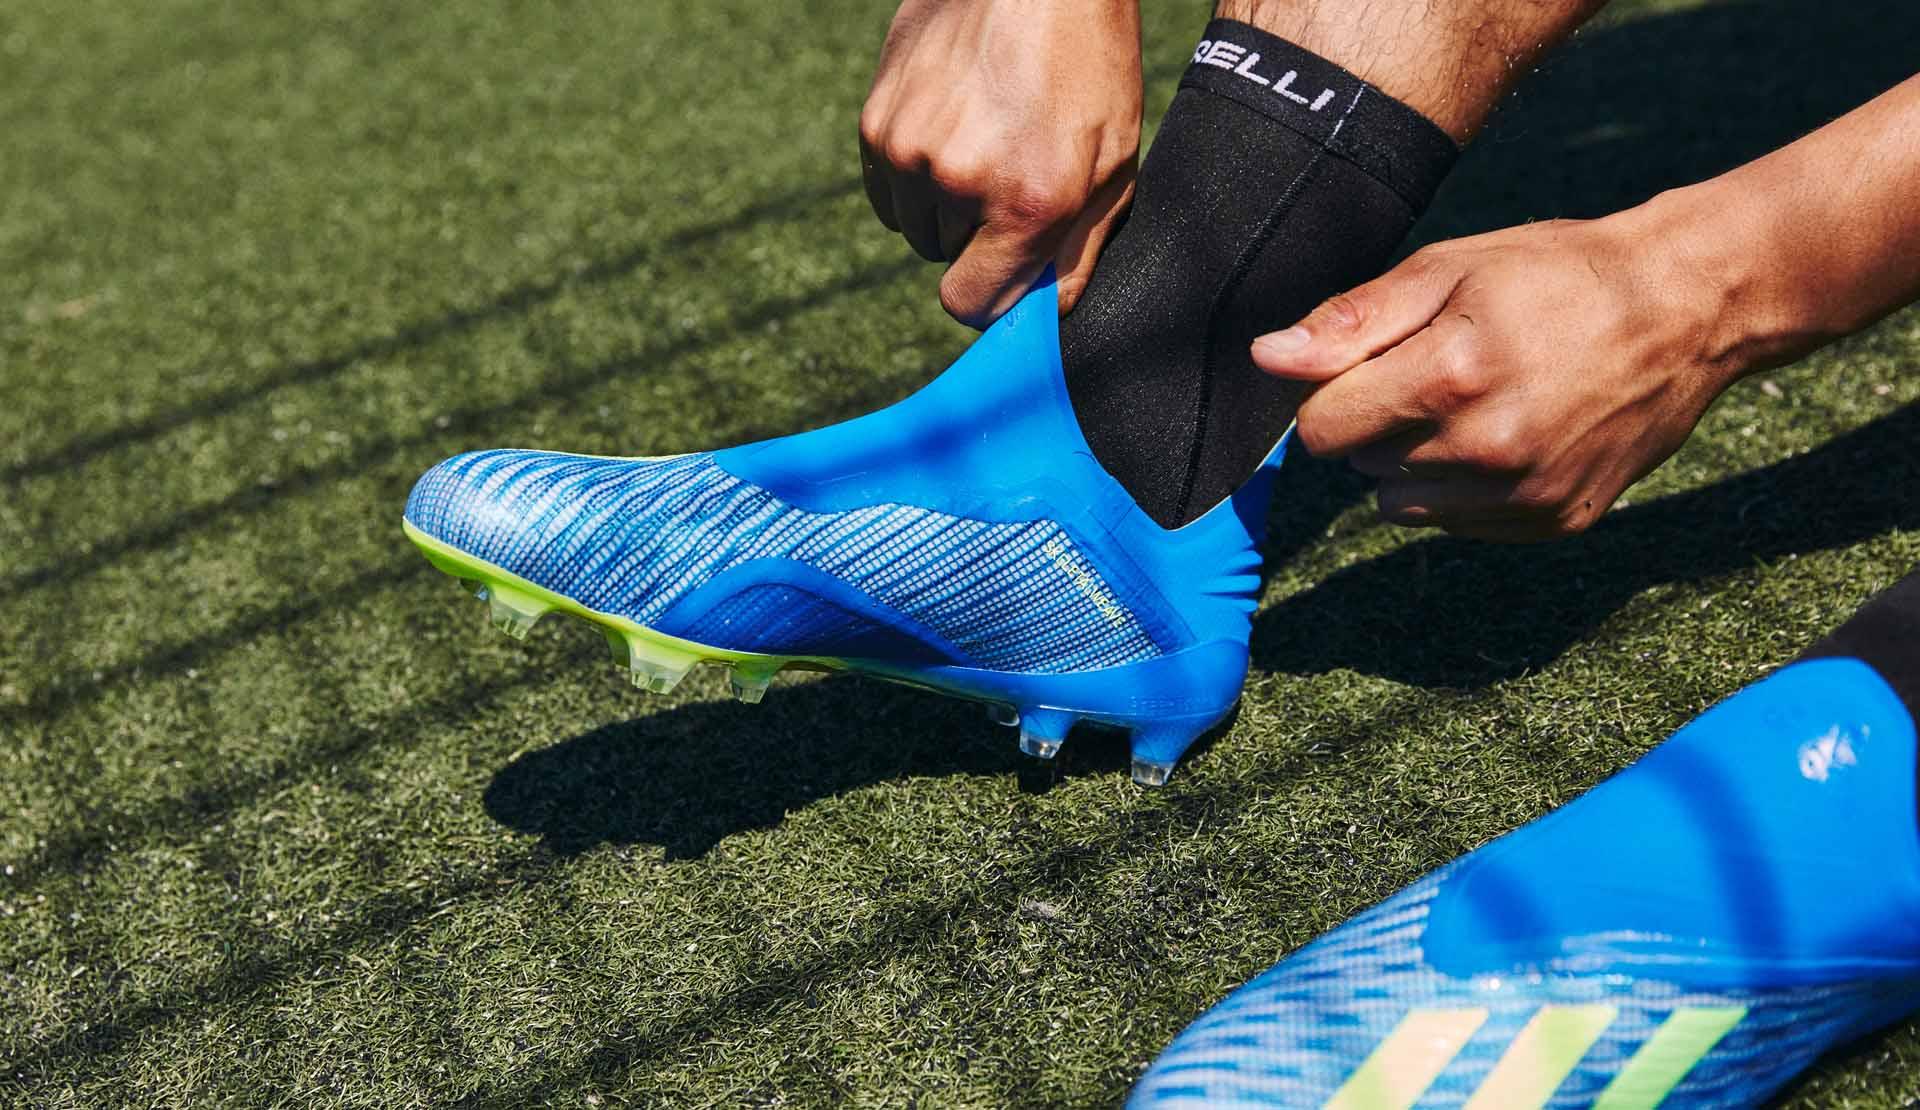 Adviento pausa Me preparé  Laced Up | adidas X 18+ Review - SoccerBible